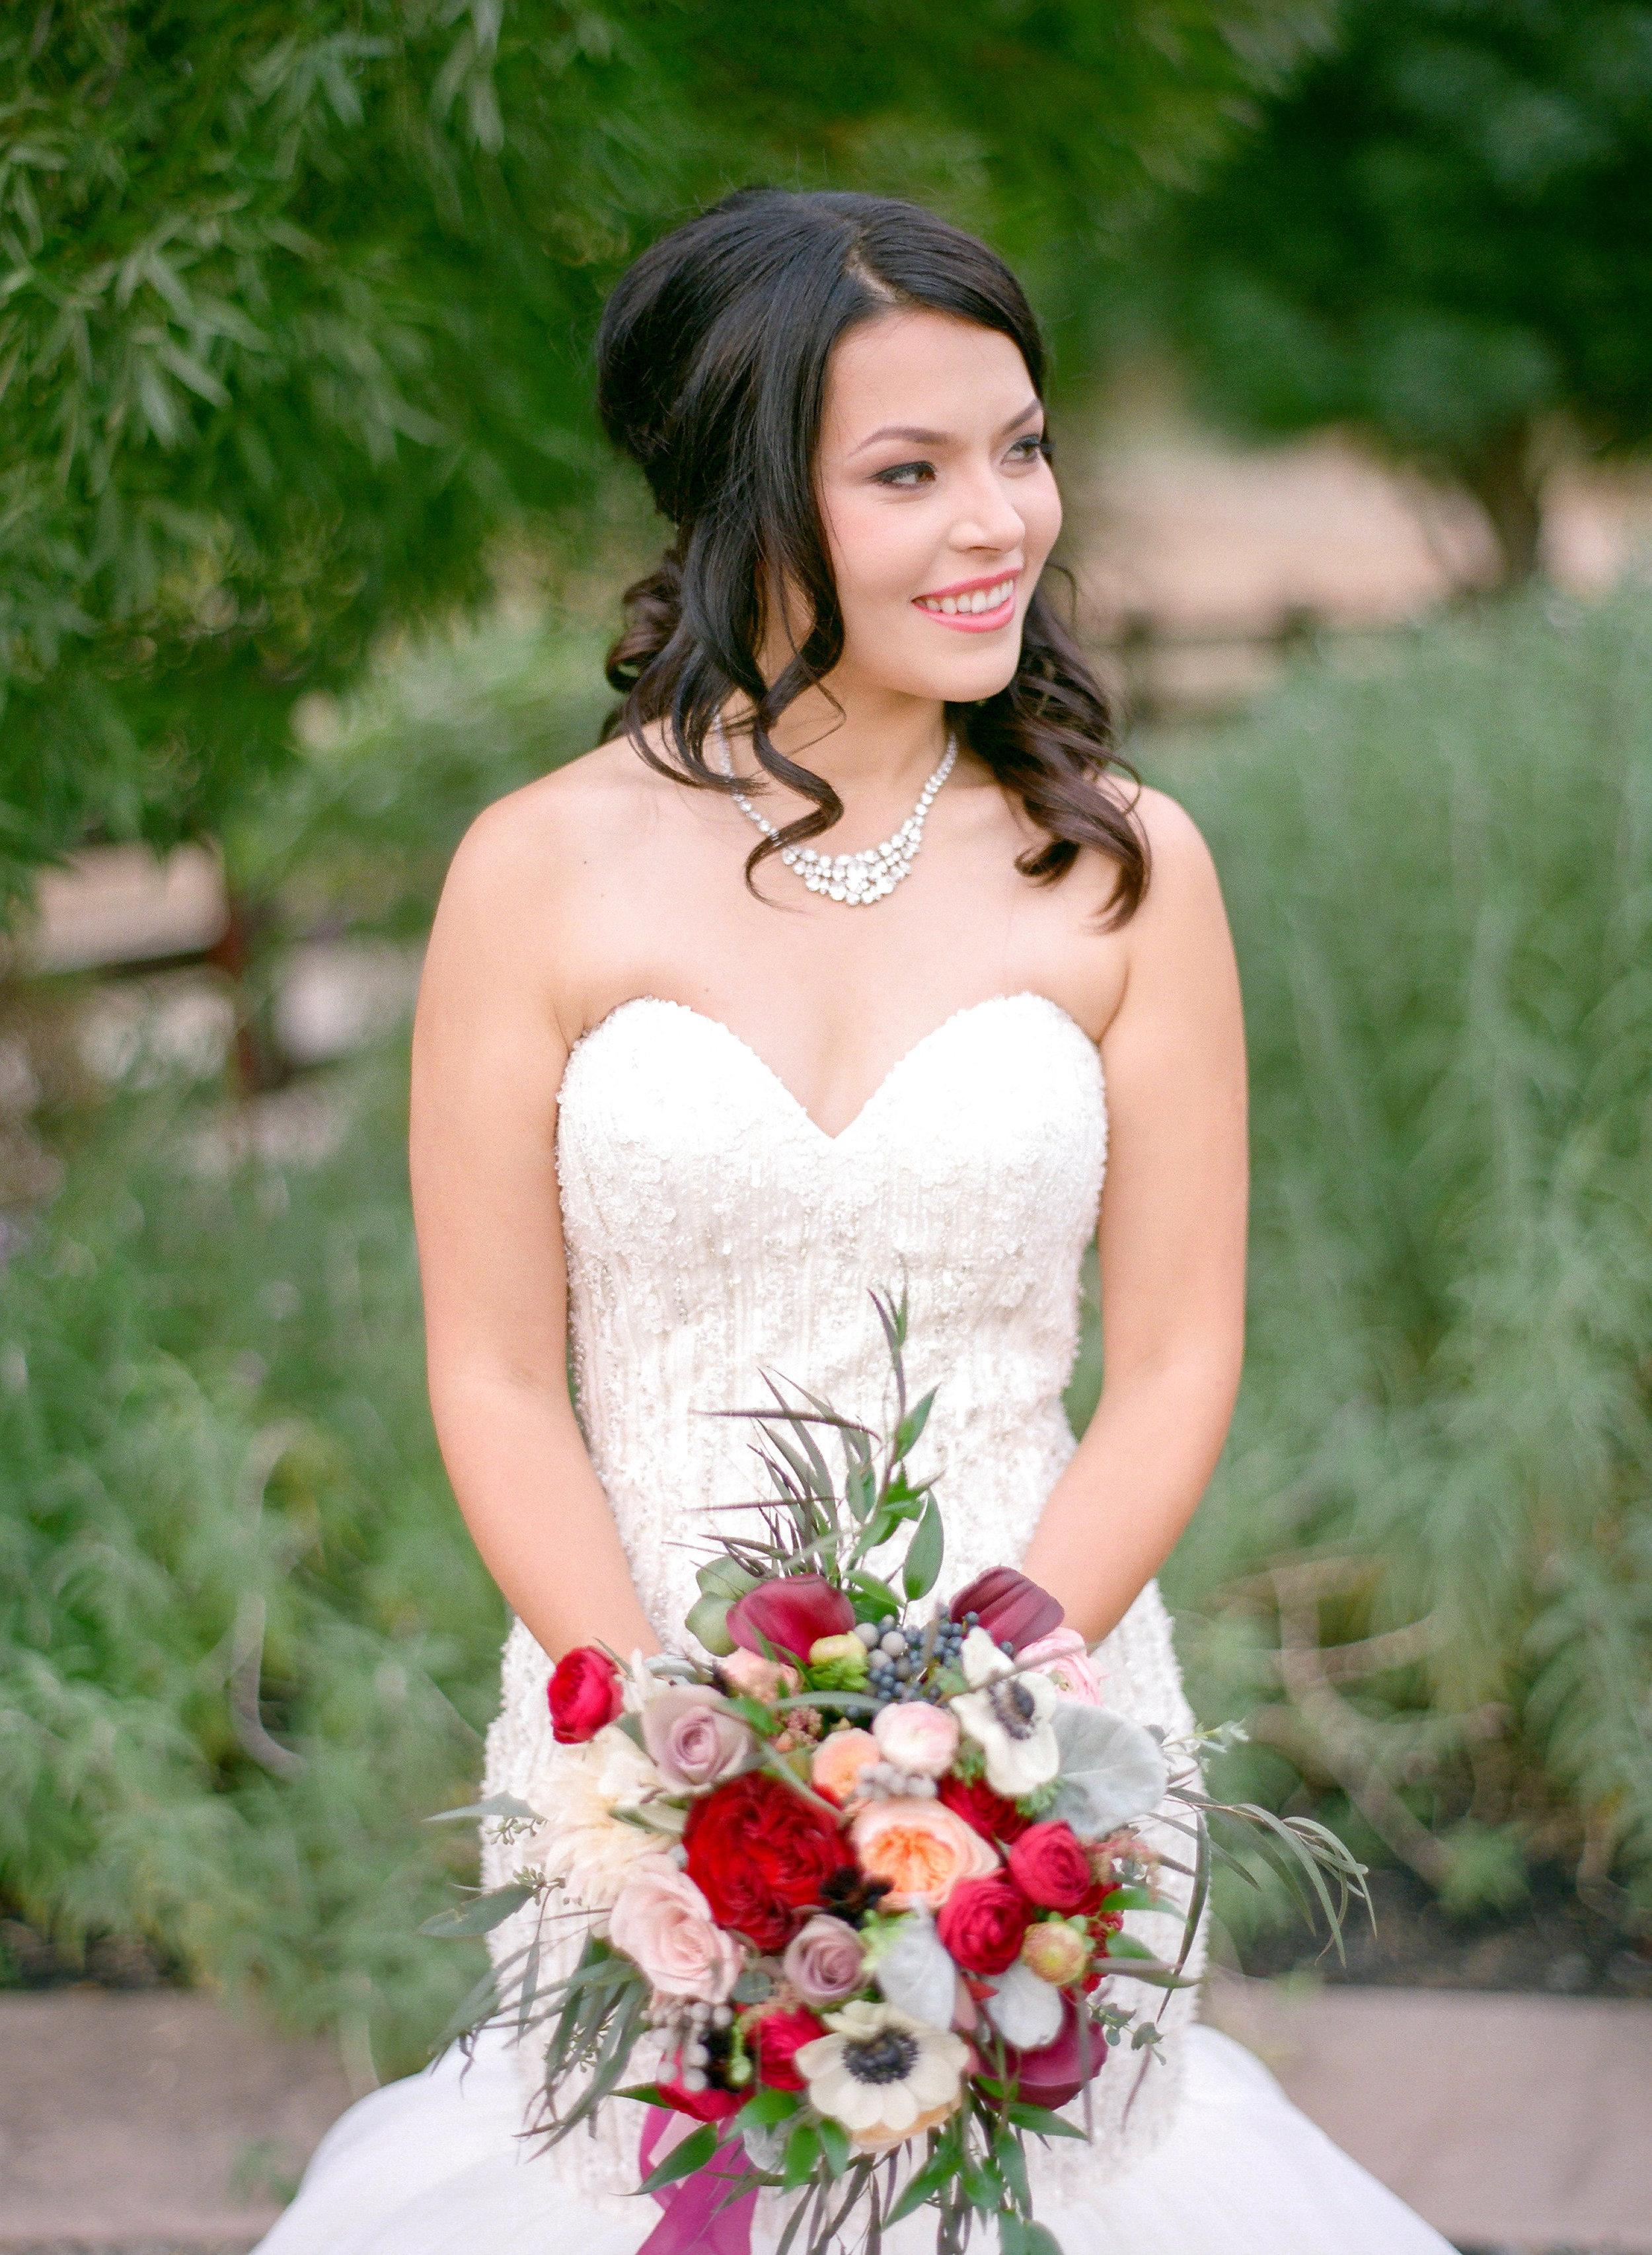 Amador_County_Wedding_Bride_Bridal_Bouquet_Burgundy_Pink_Gold_Rancho_Victoria_Vineyard_Northern_California.jpg